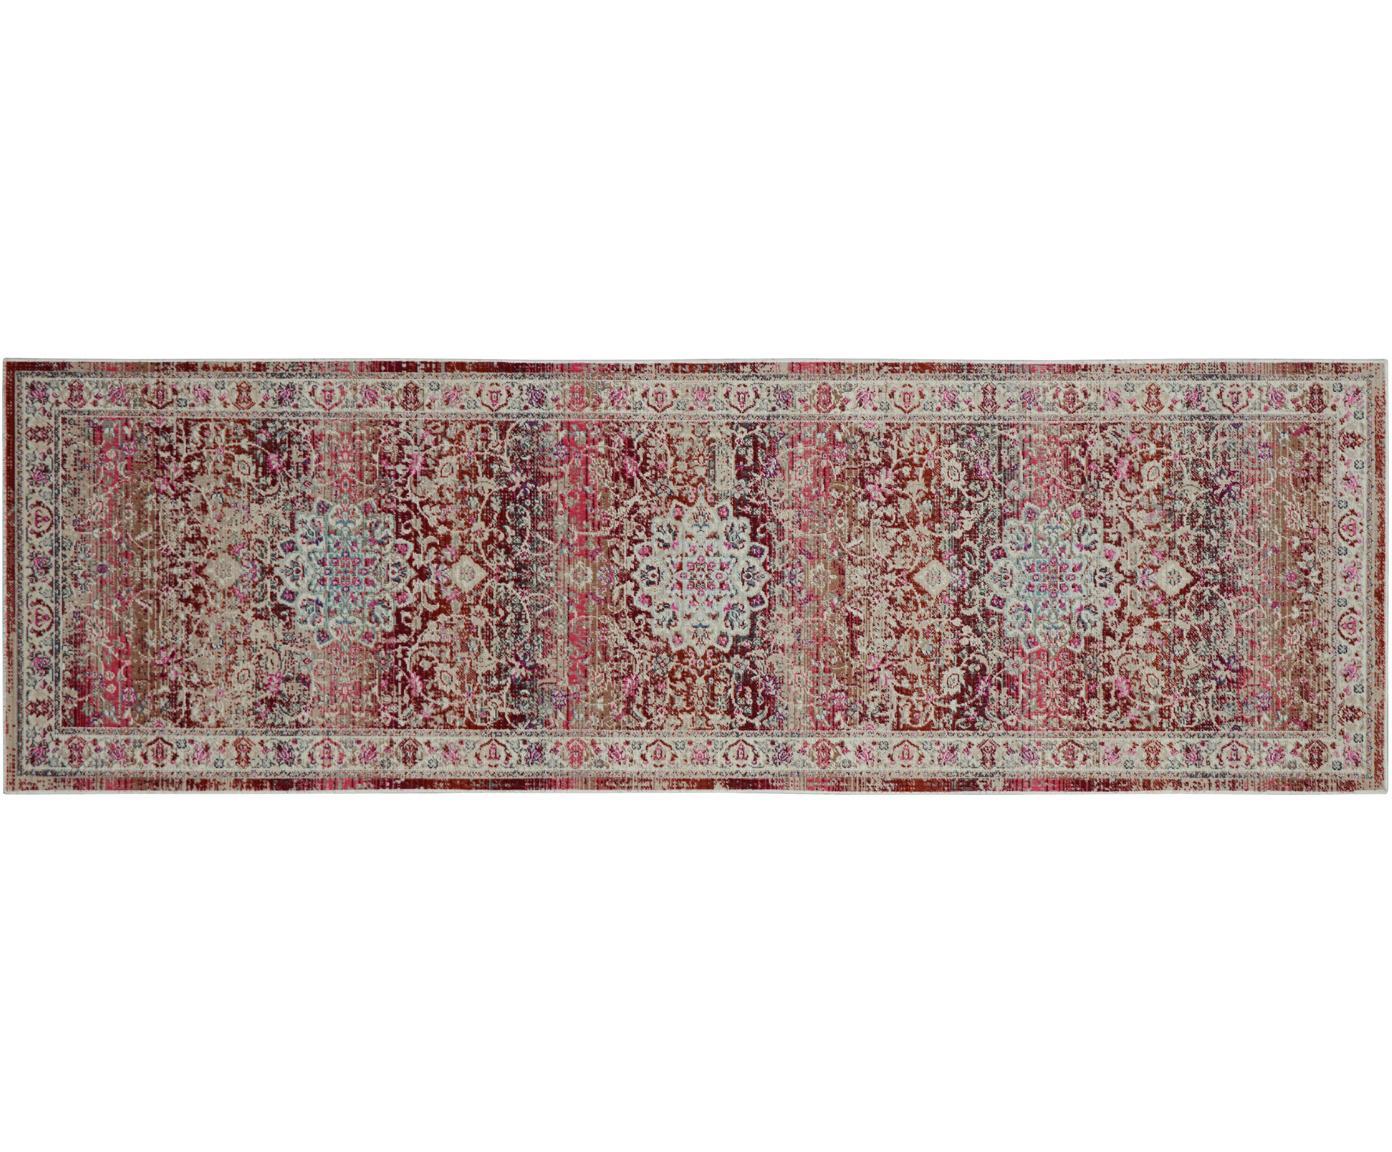 Alfombra de pelo corto Kashan Age, estilo oriental, Parte superior: 100%polipropileno, Reverso: látex, Beige, tonos de rojo, An 60 x L 180 cm